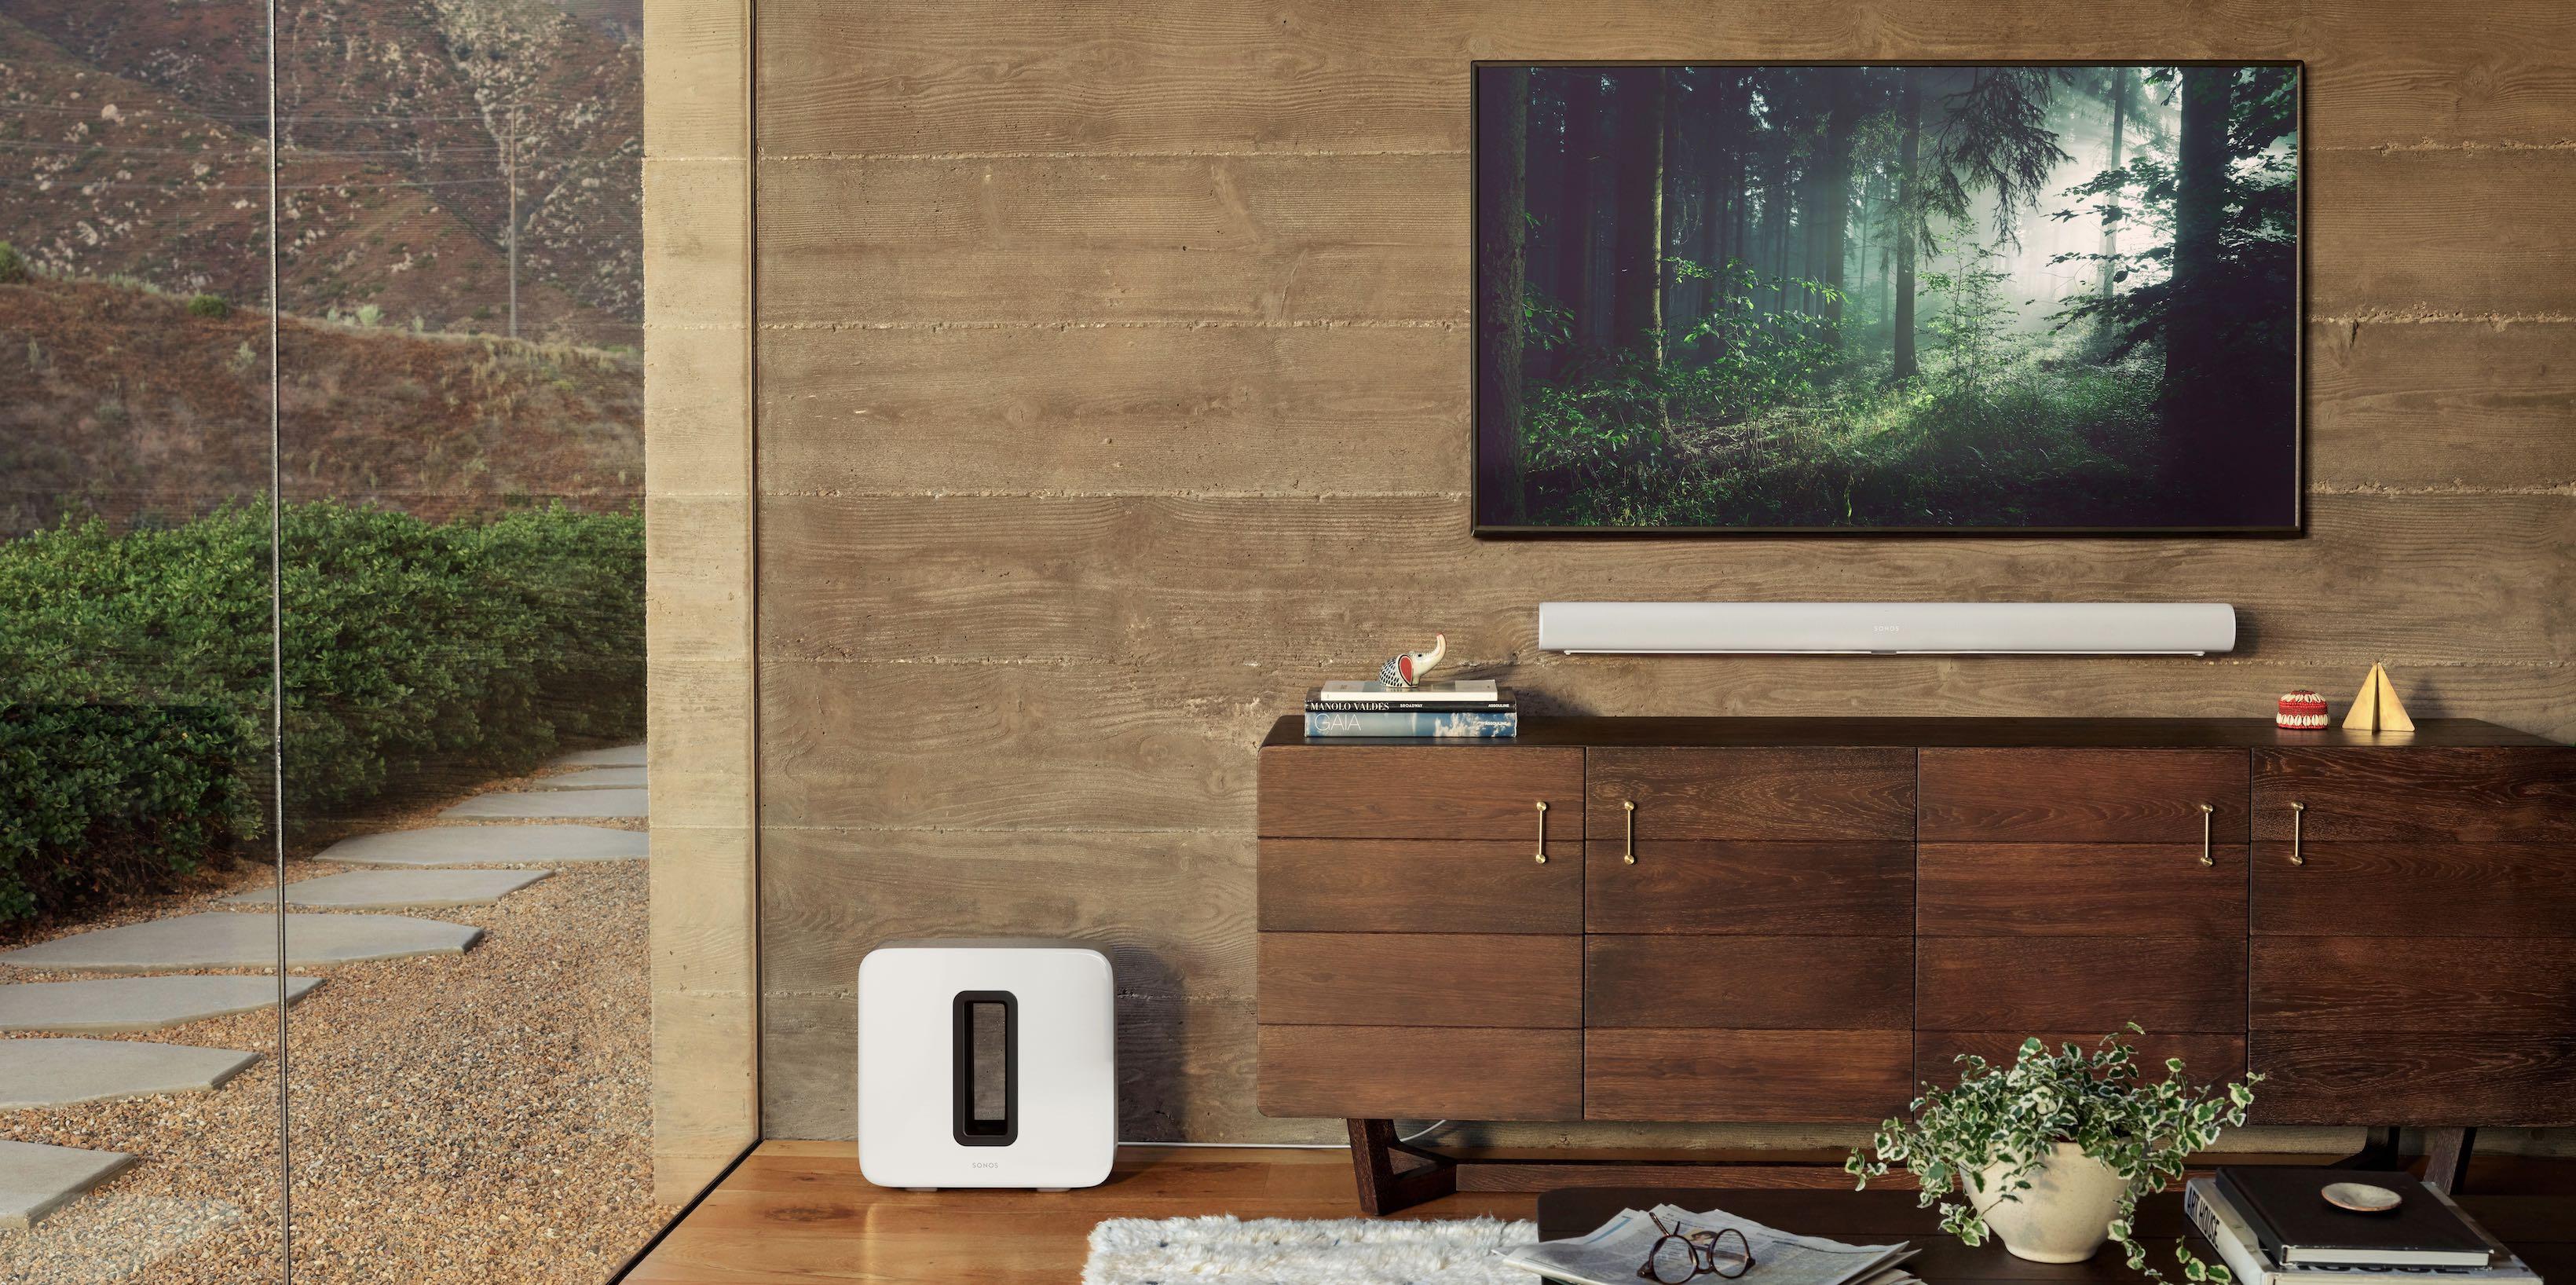 Sonos Arc TV sounder Dolby Atmos AirPlay 2